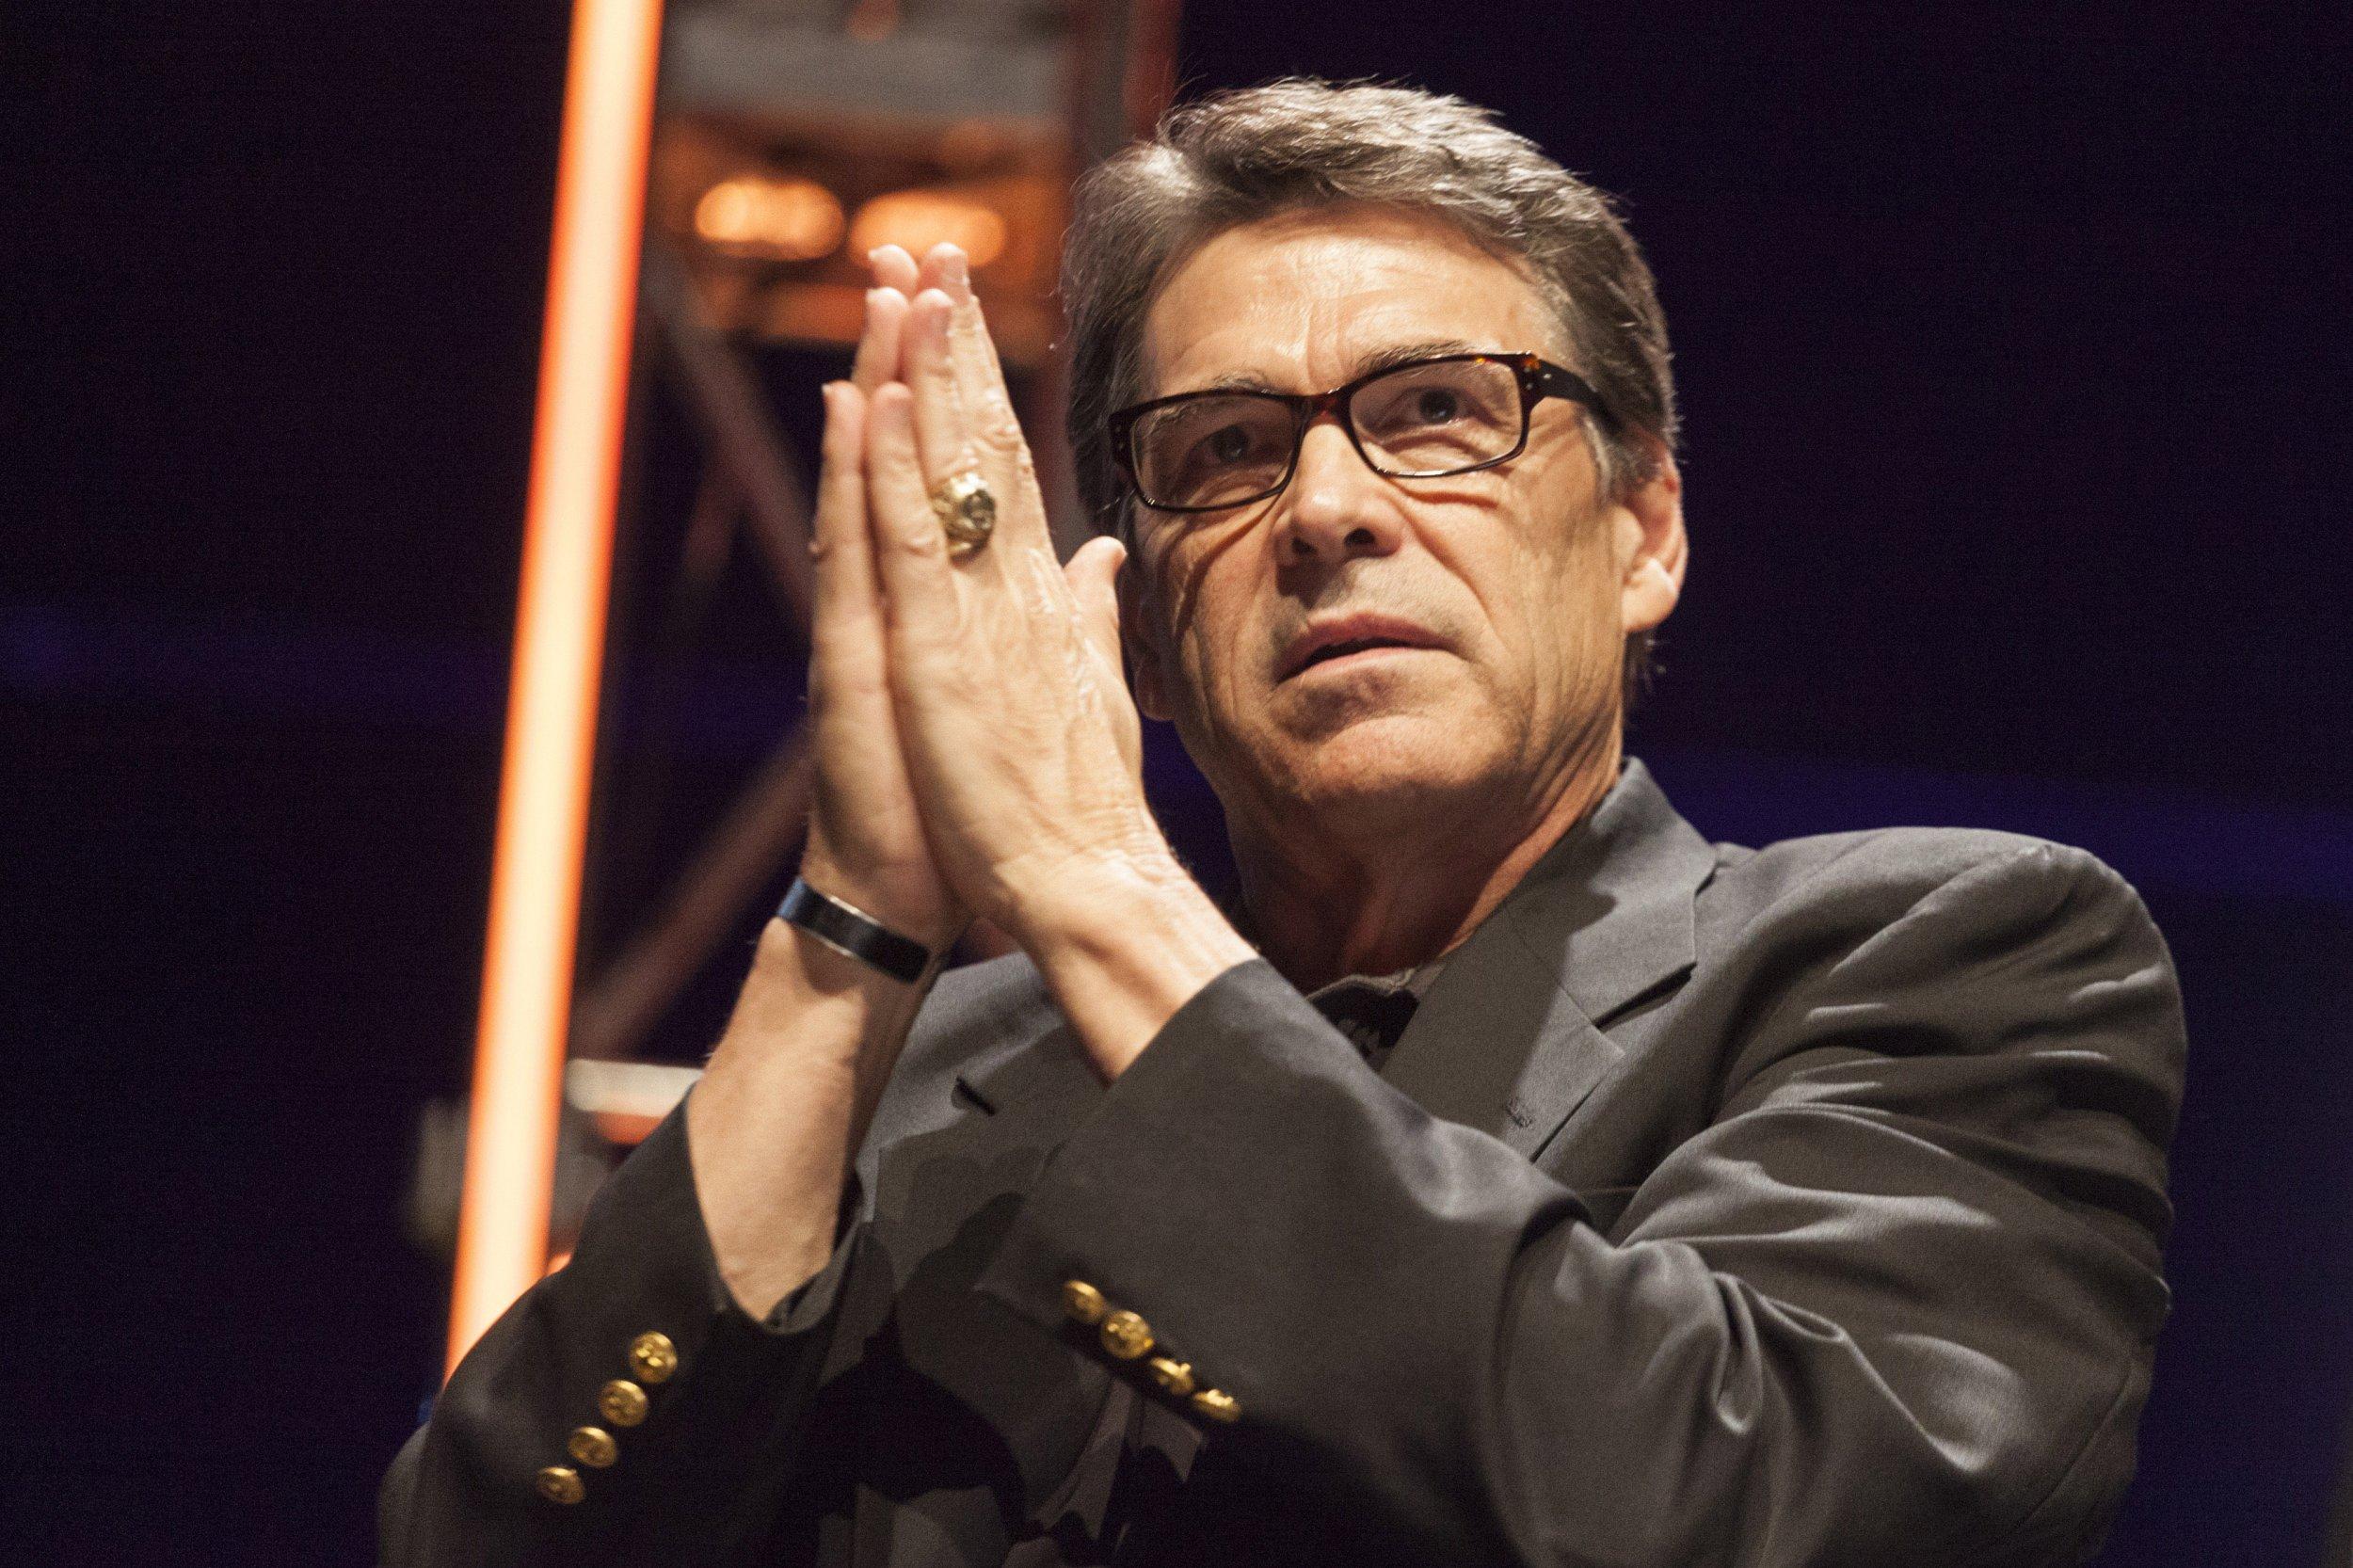 Rick Perry prayer hands